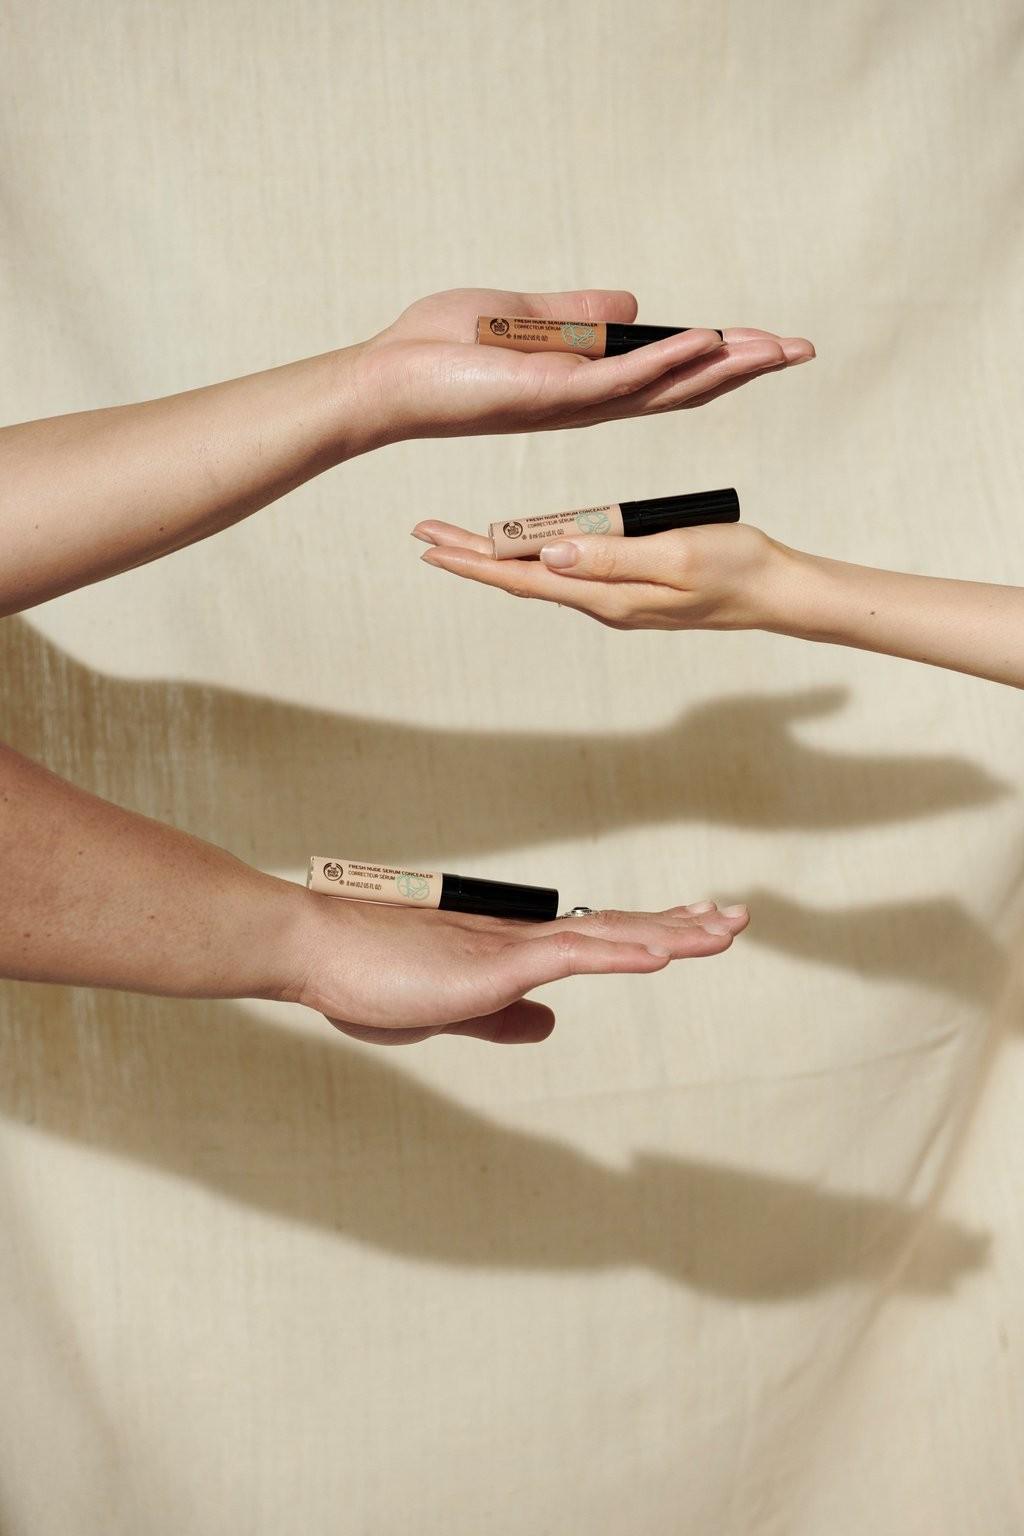 Hands holding The Body Shop Concealer